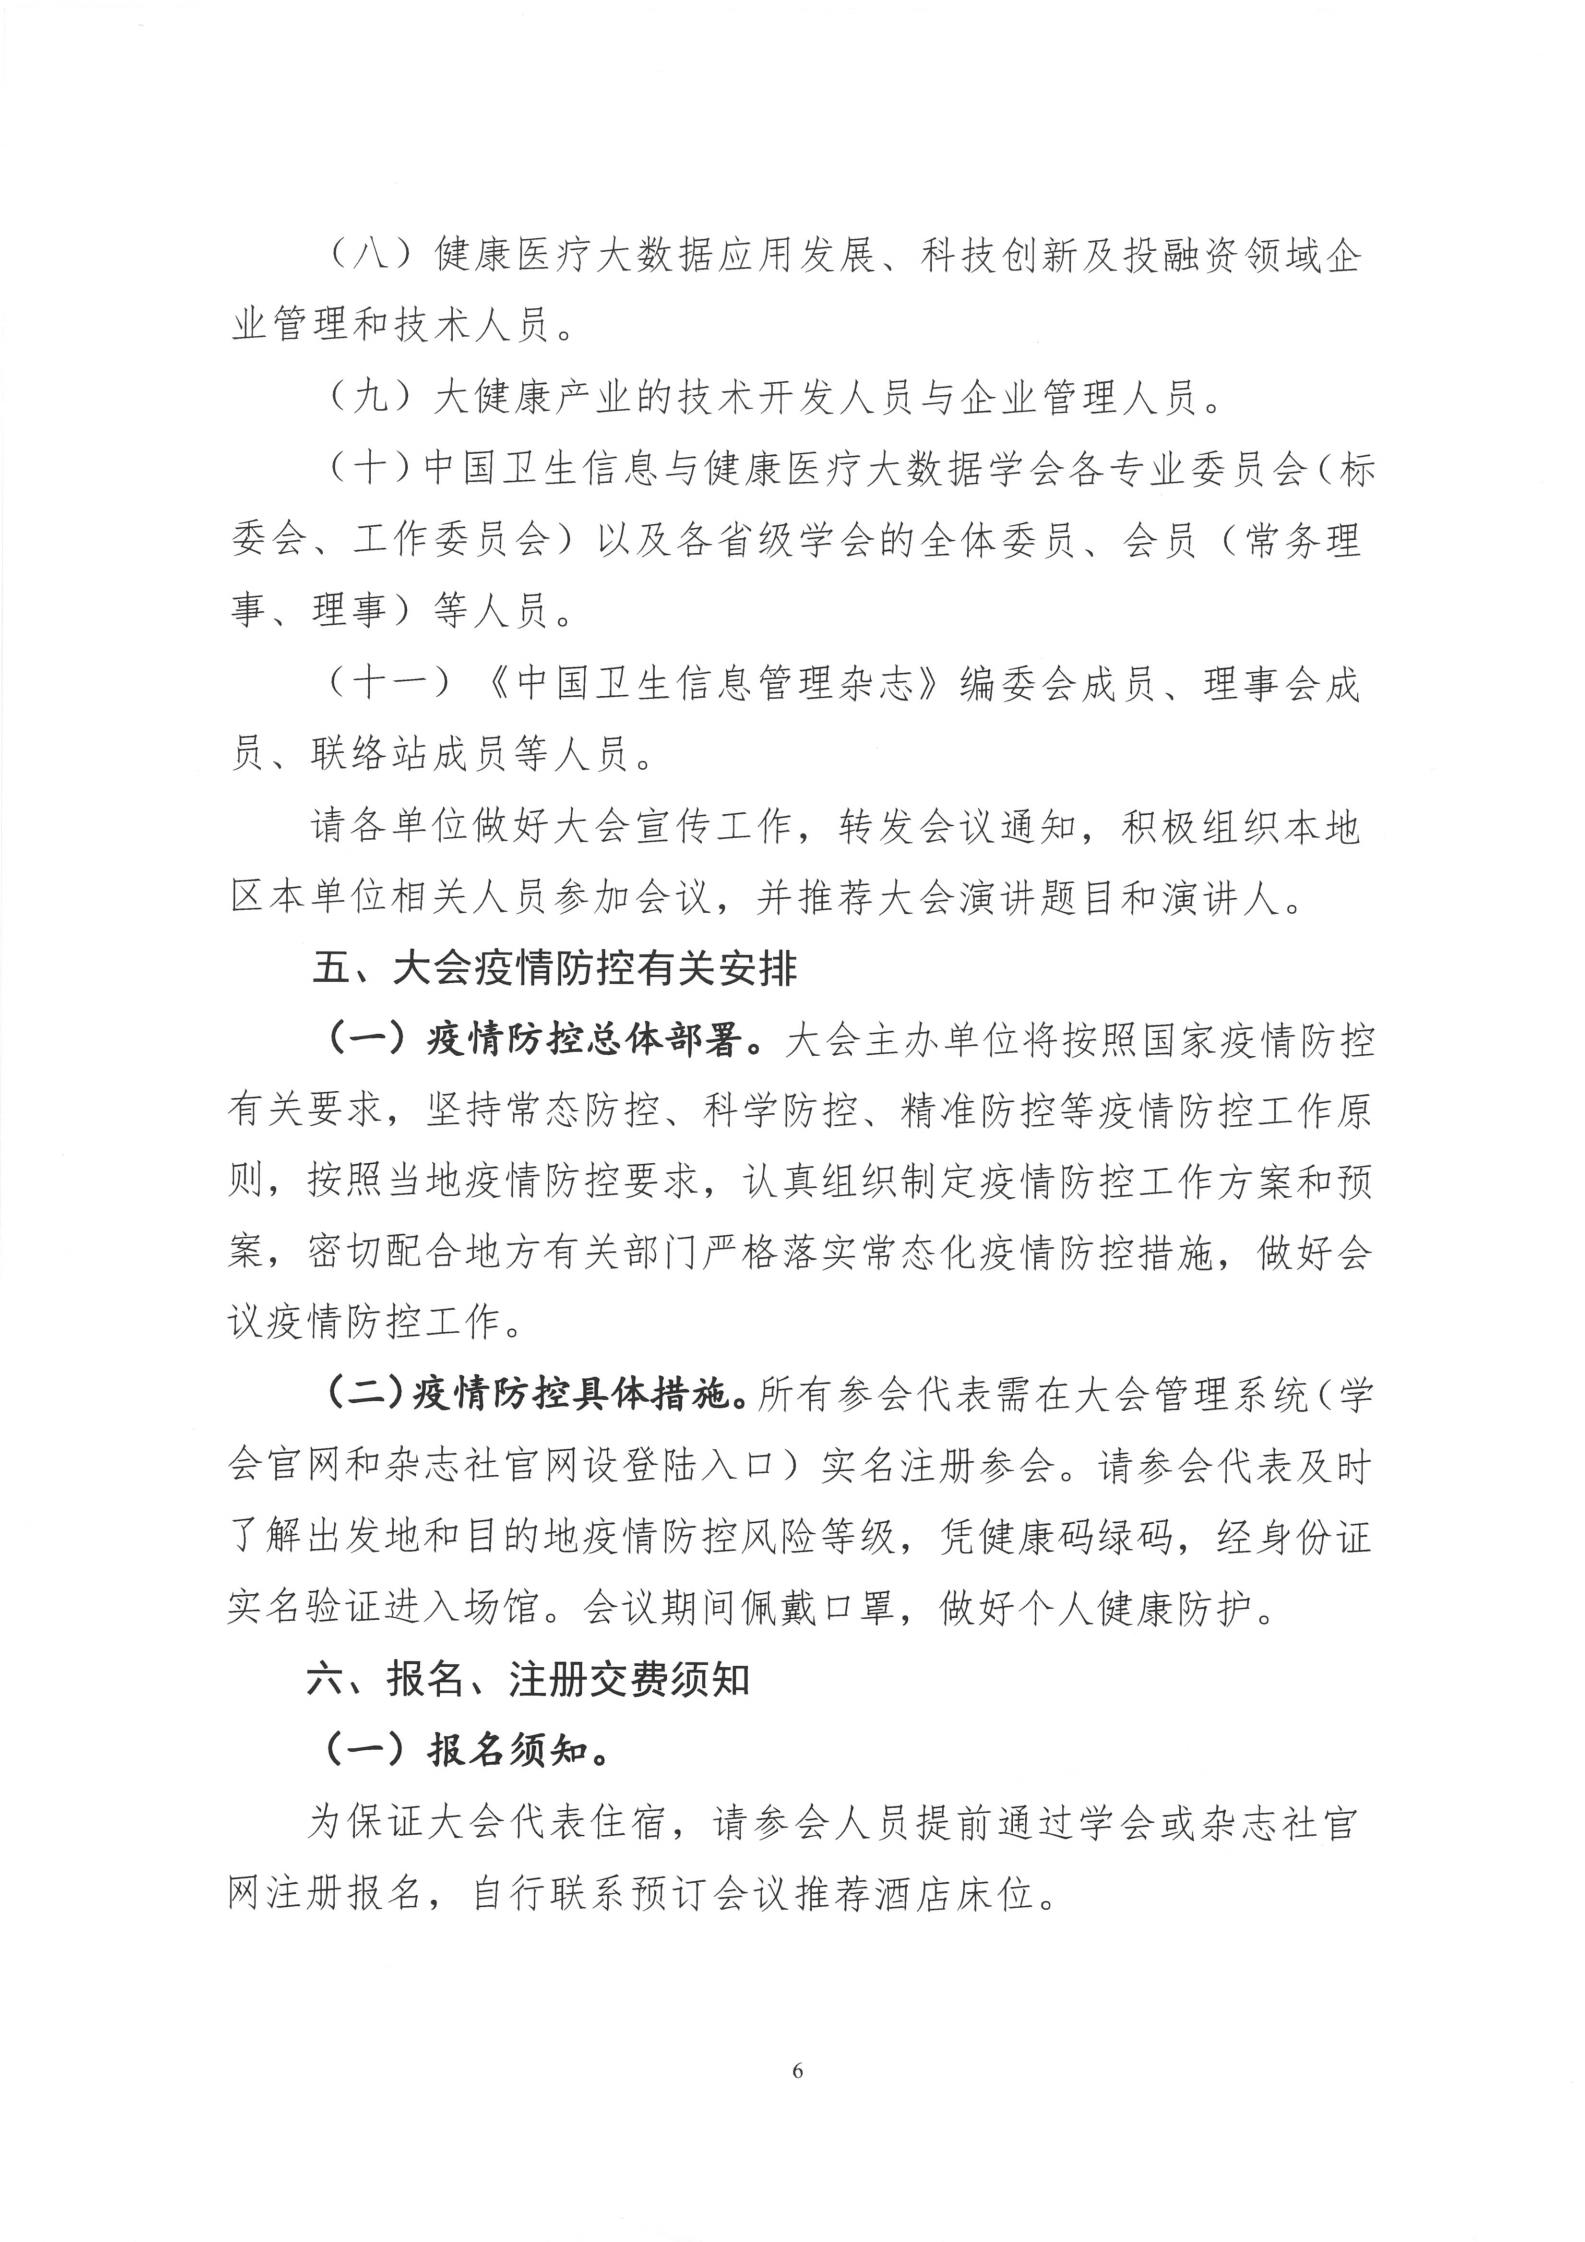 2021CHITEC大会通知_05.png